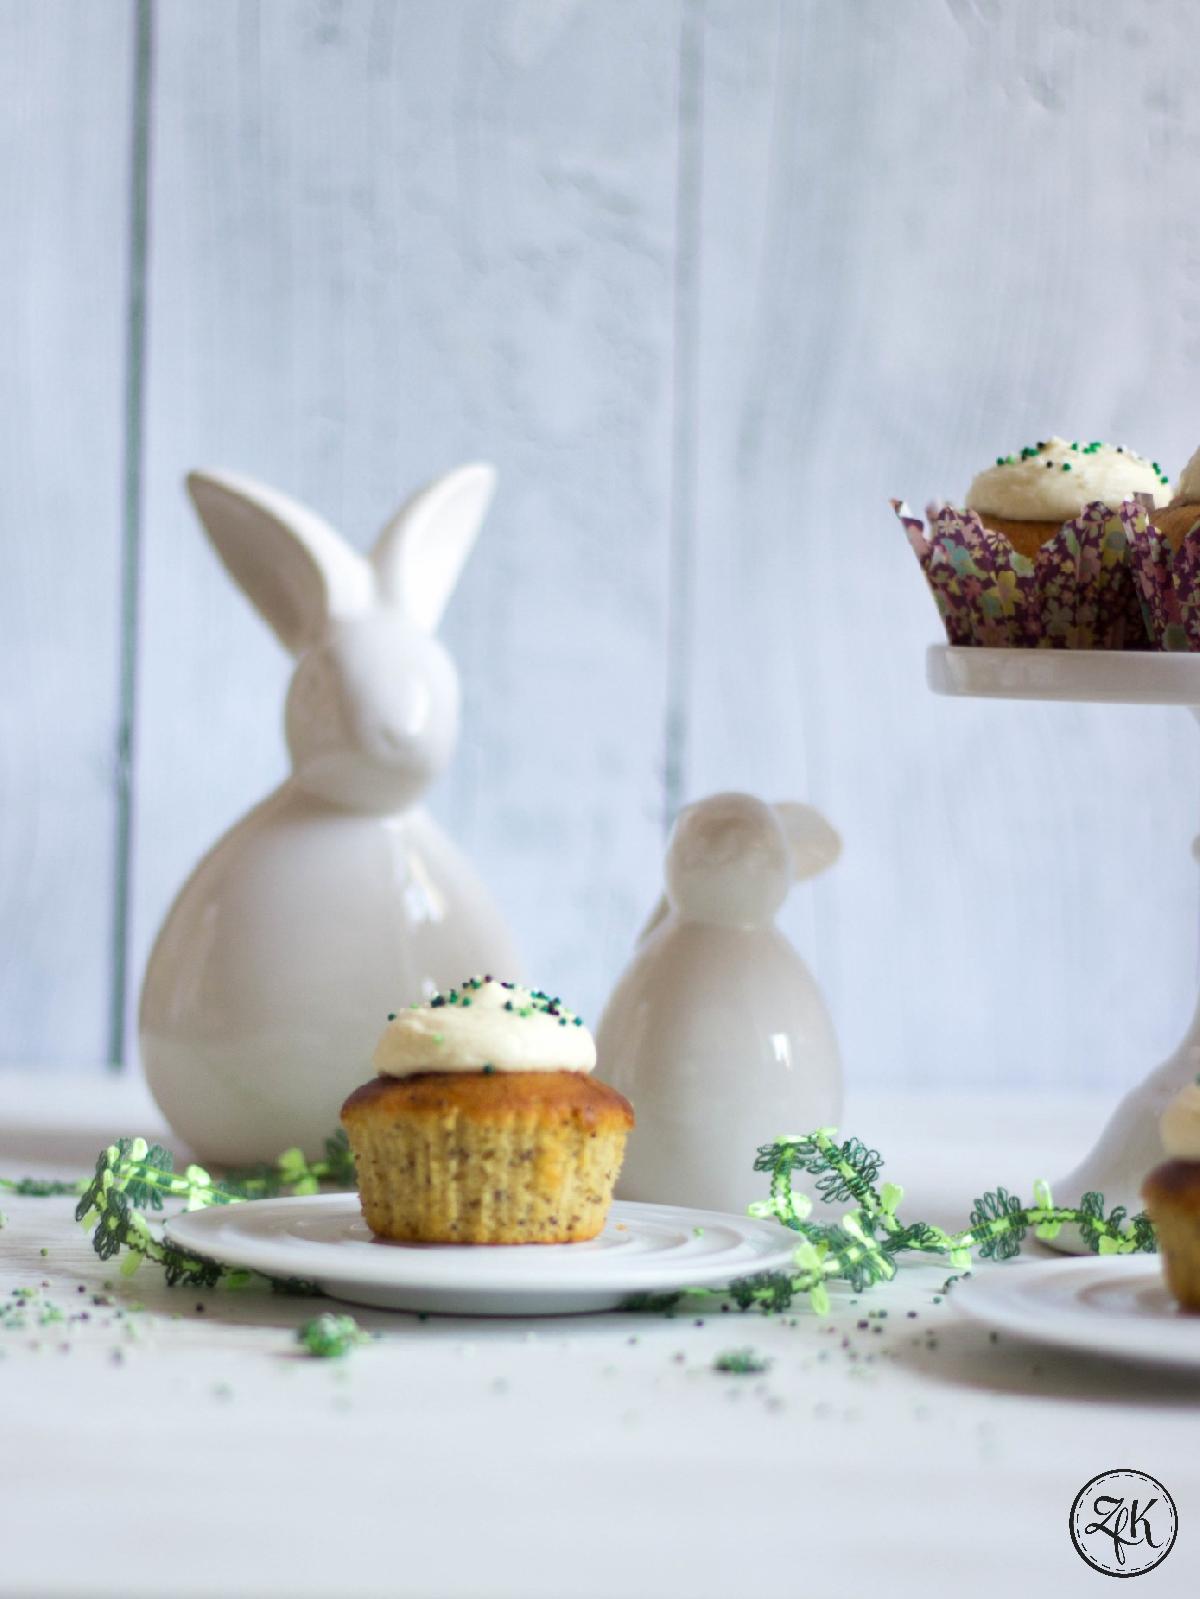 Saftige Cupcakes mit Lemoncurd und Mohn